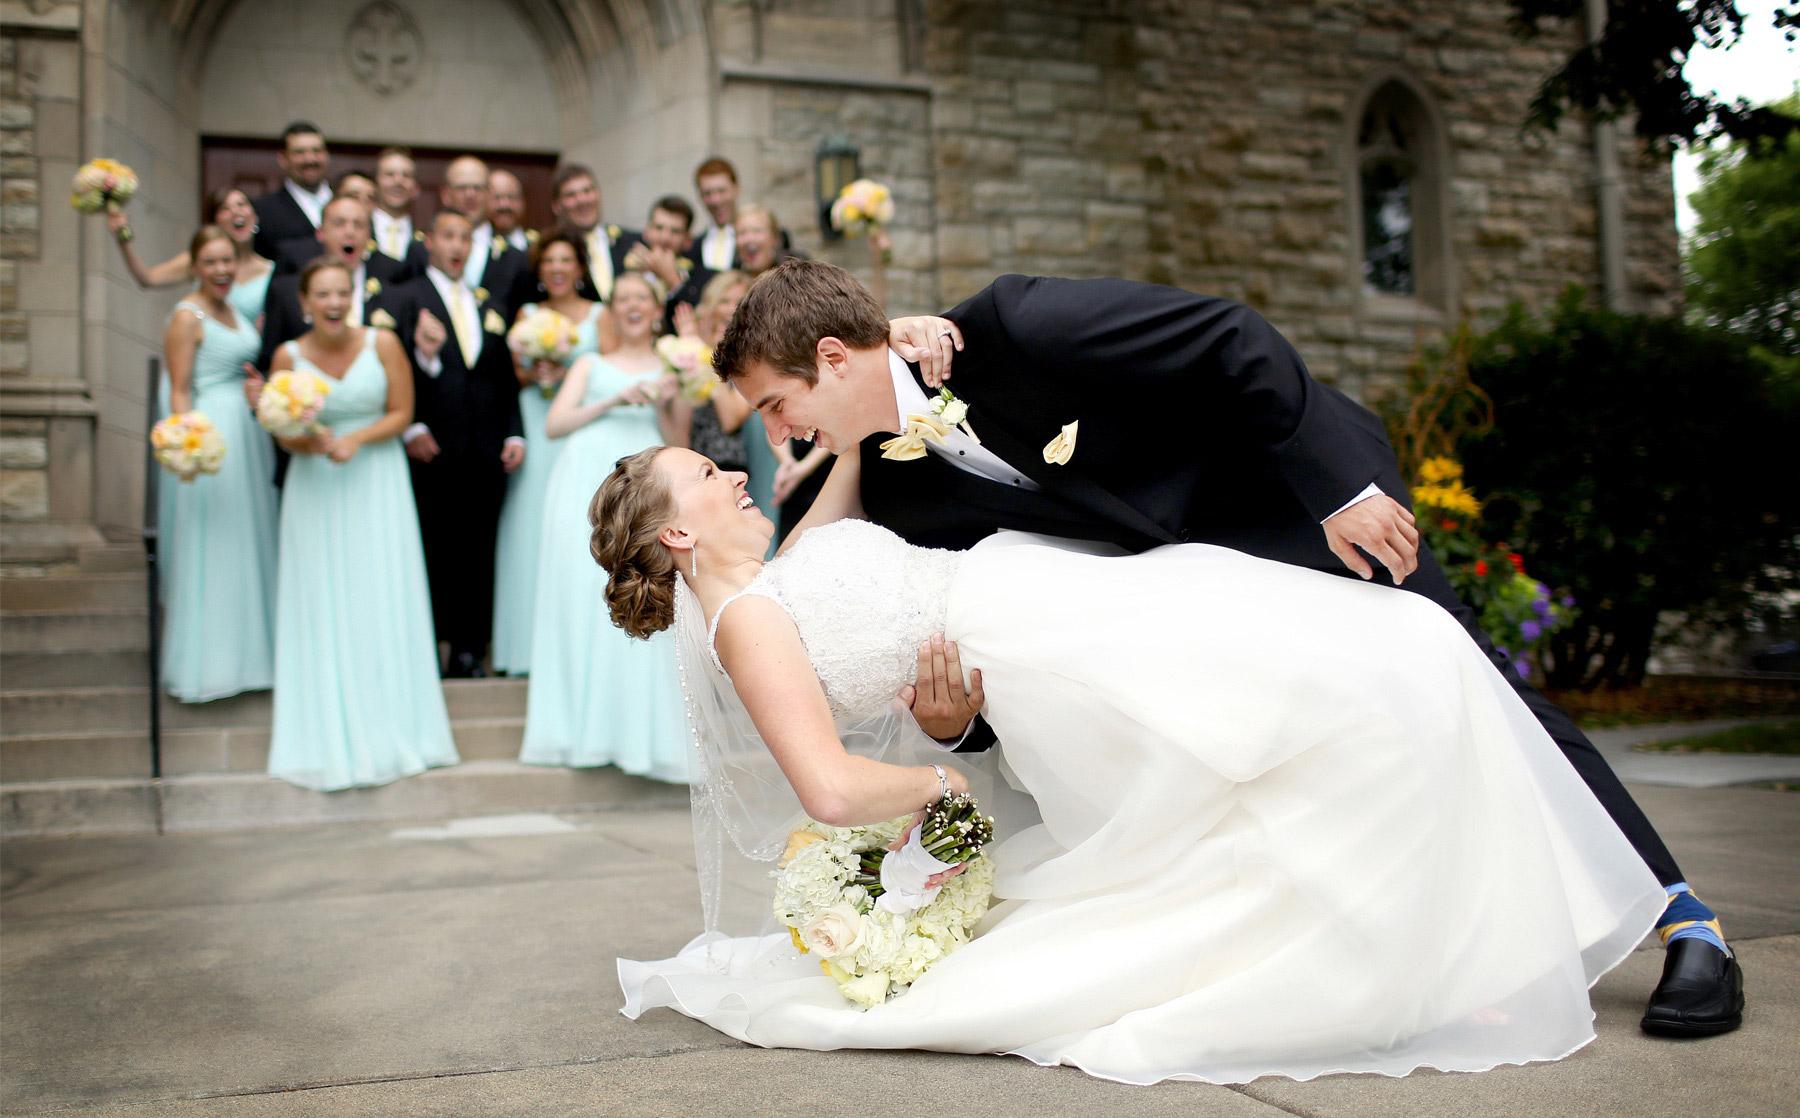 09-Minneapolis-Minnesota-Wedding-Photography-by-Vick-Photography-Edina-Wedding-Party-Group-Grace-&-Nick.jpg